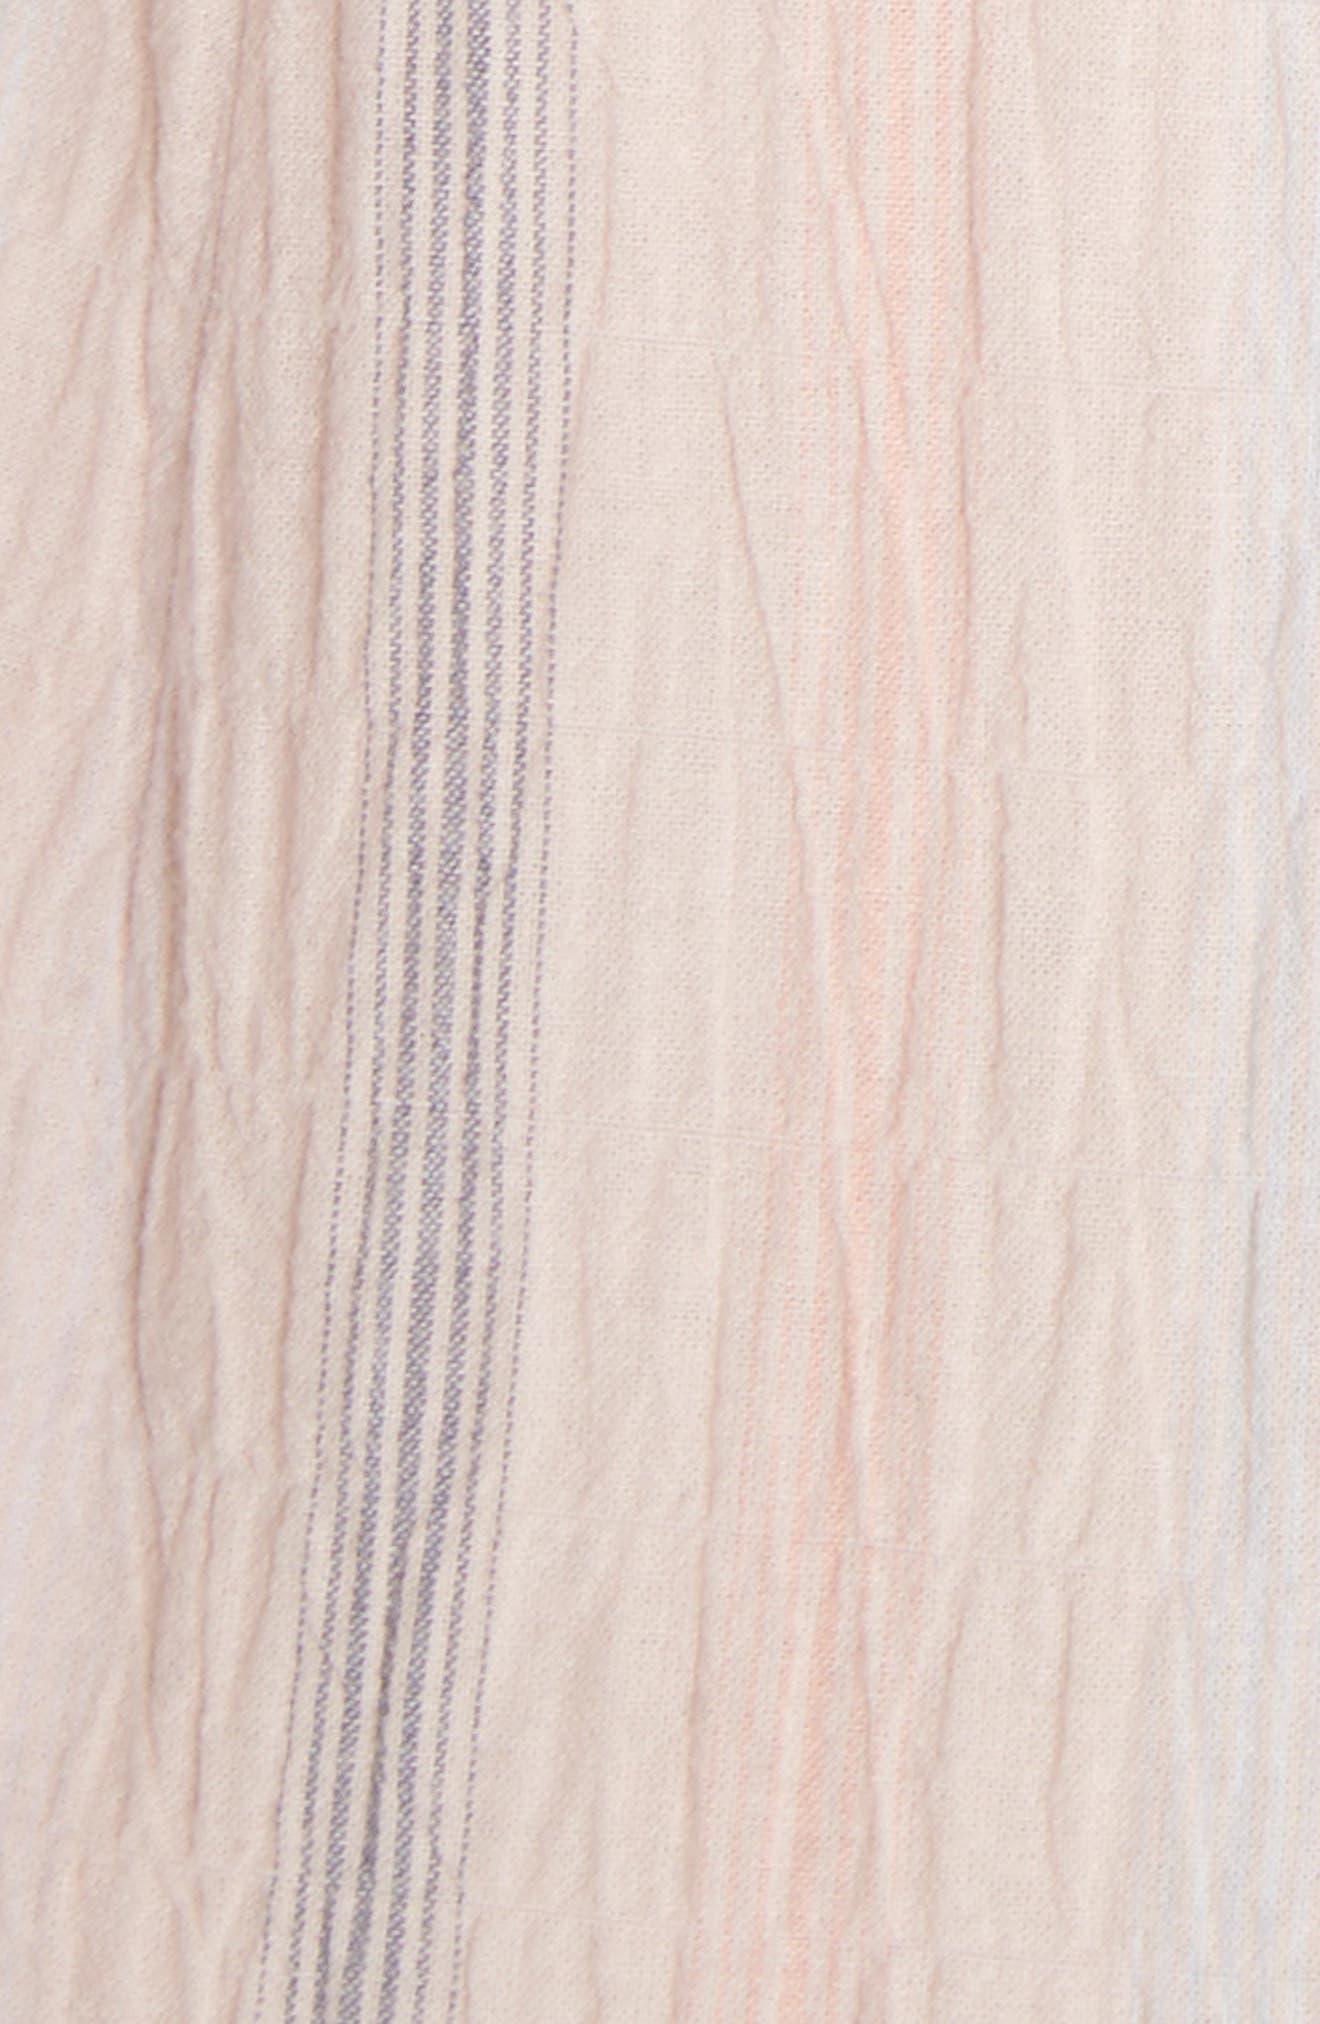 Stripe Ruffle Cap Sleeve Dress,                             Alternate thumbnail 5, color,